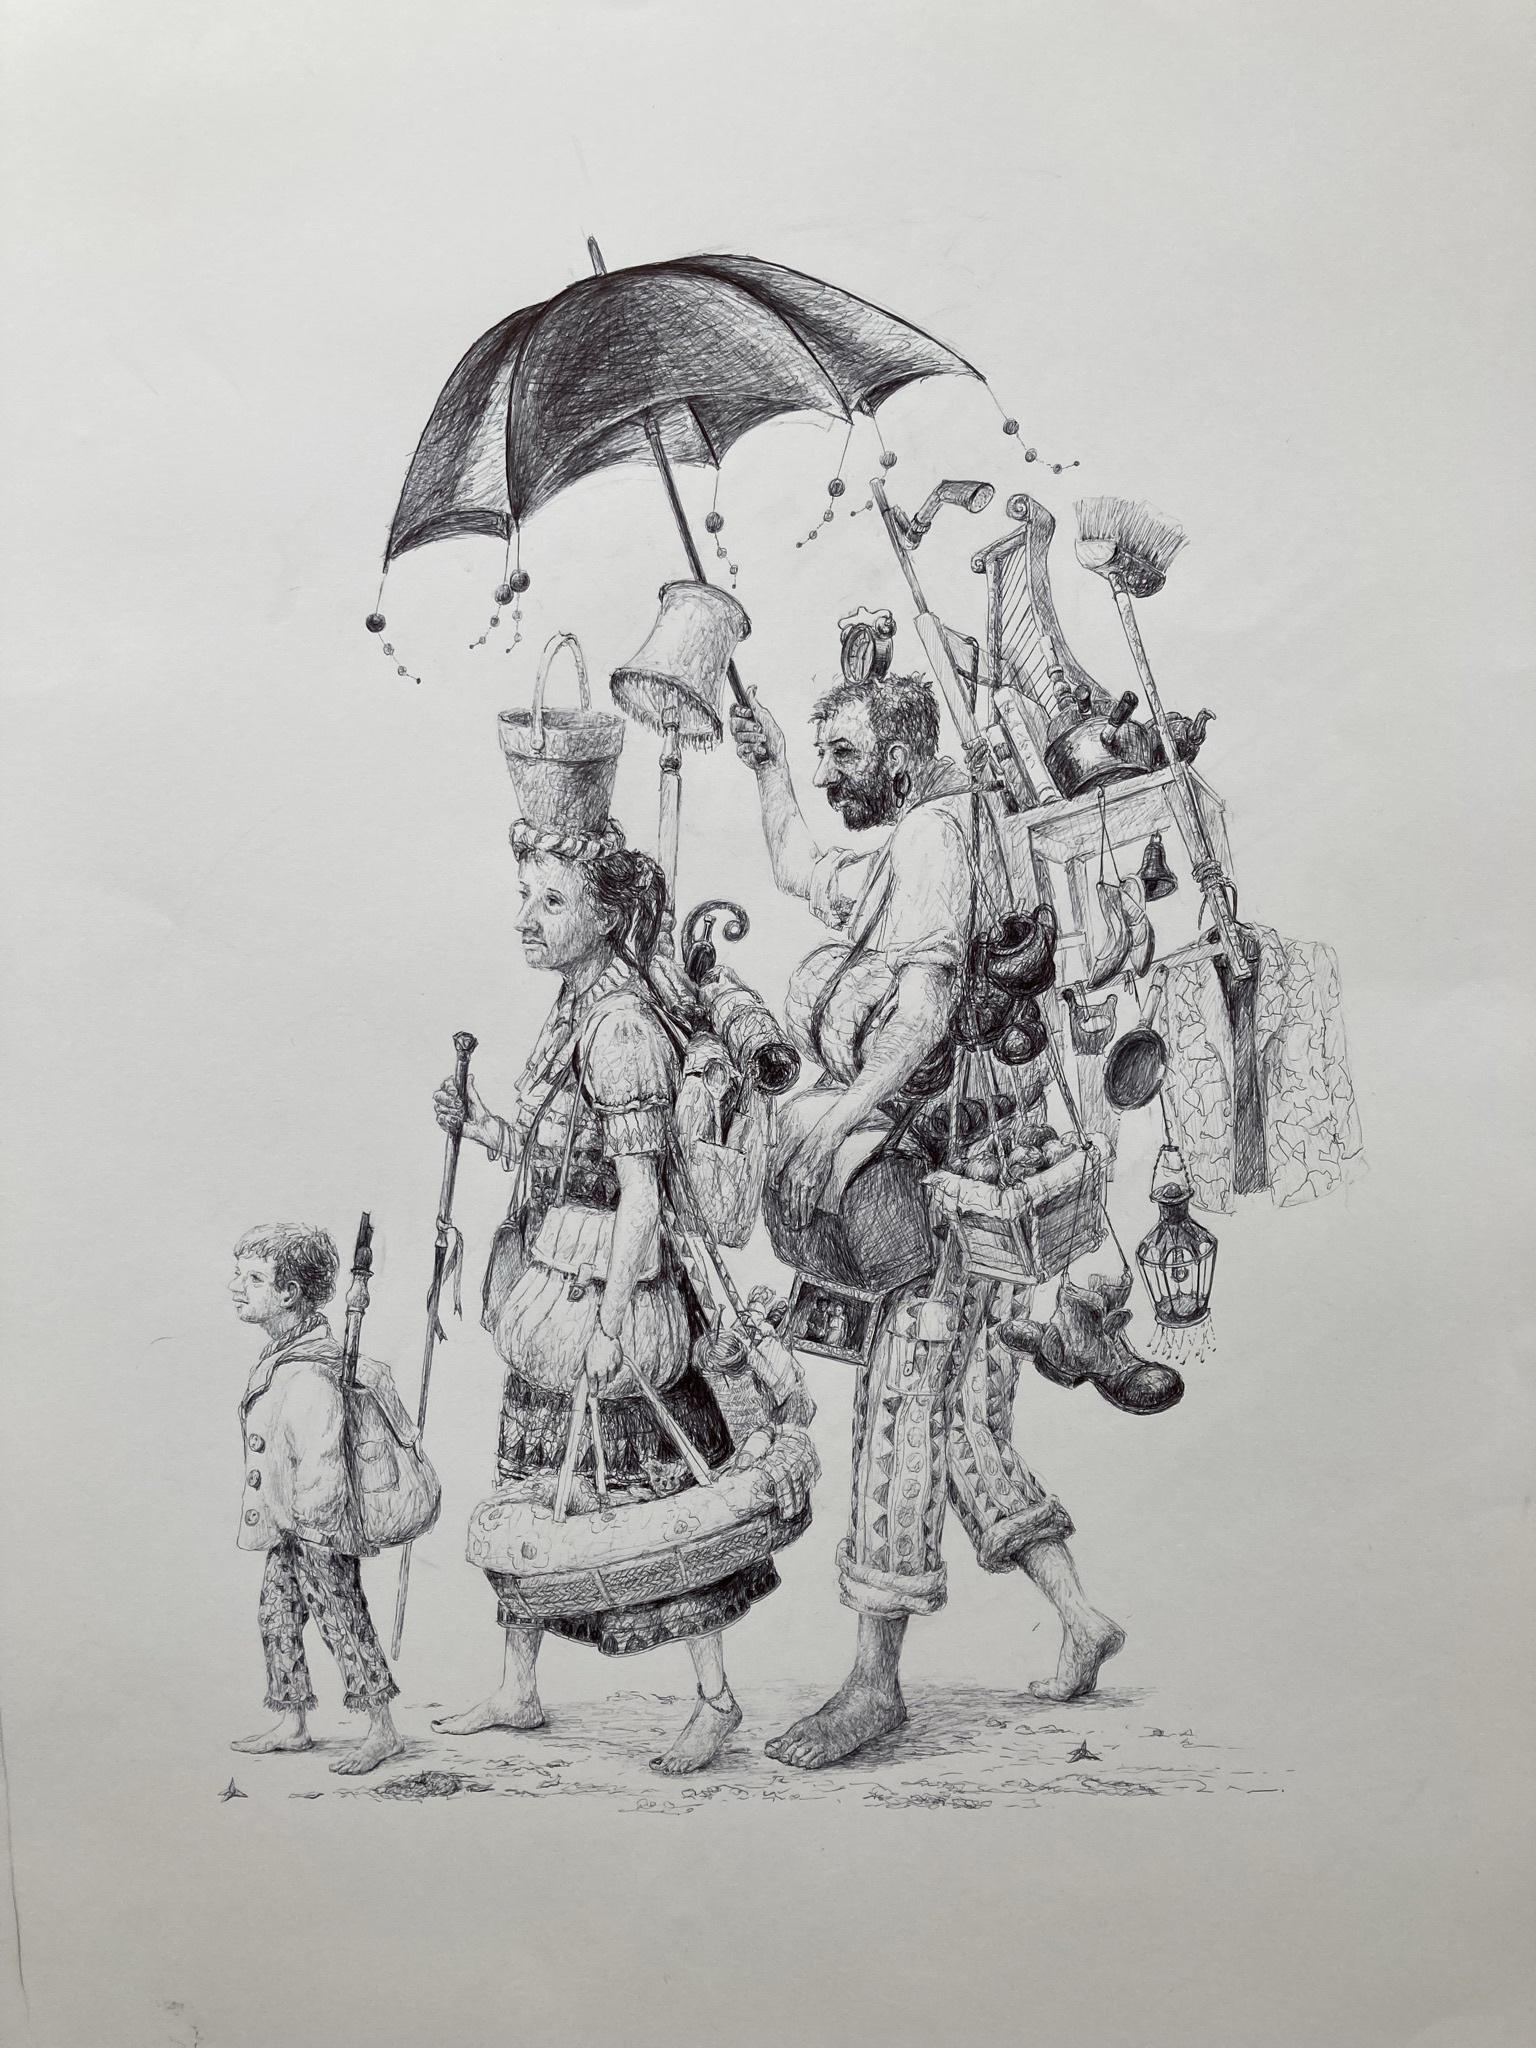 Arrival artwork